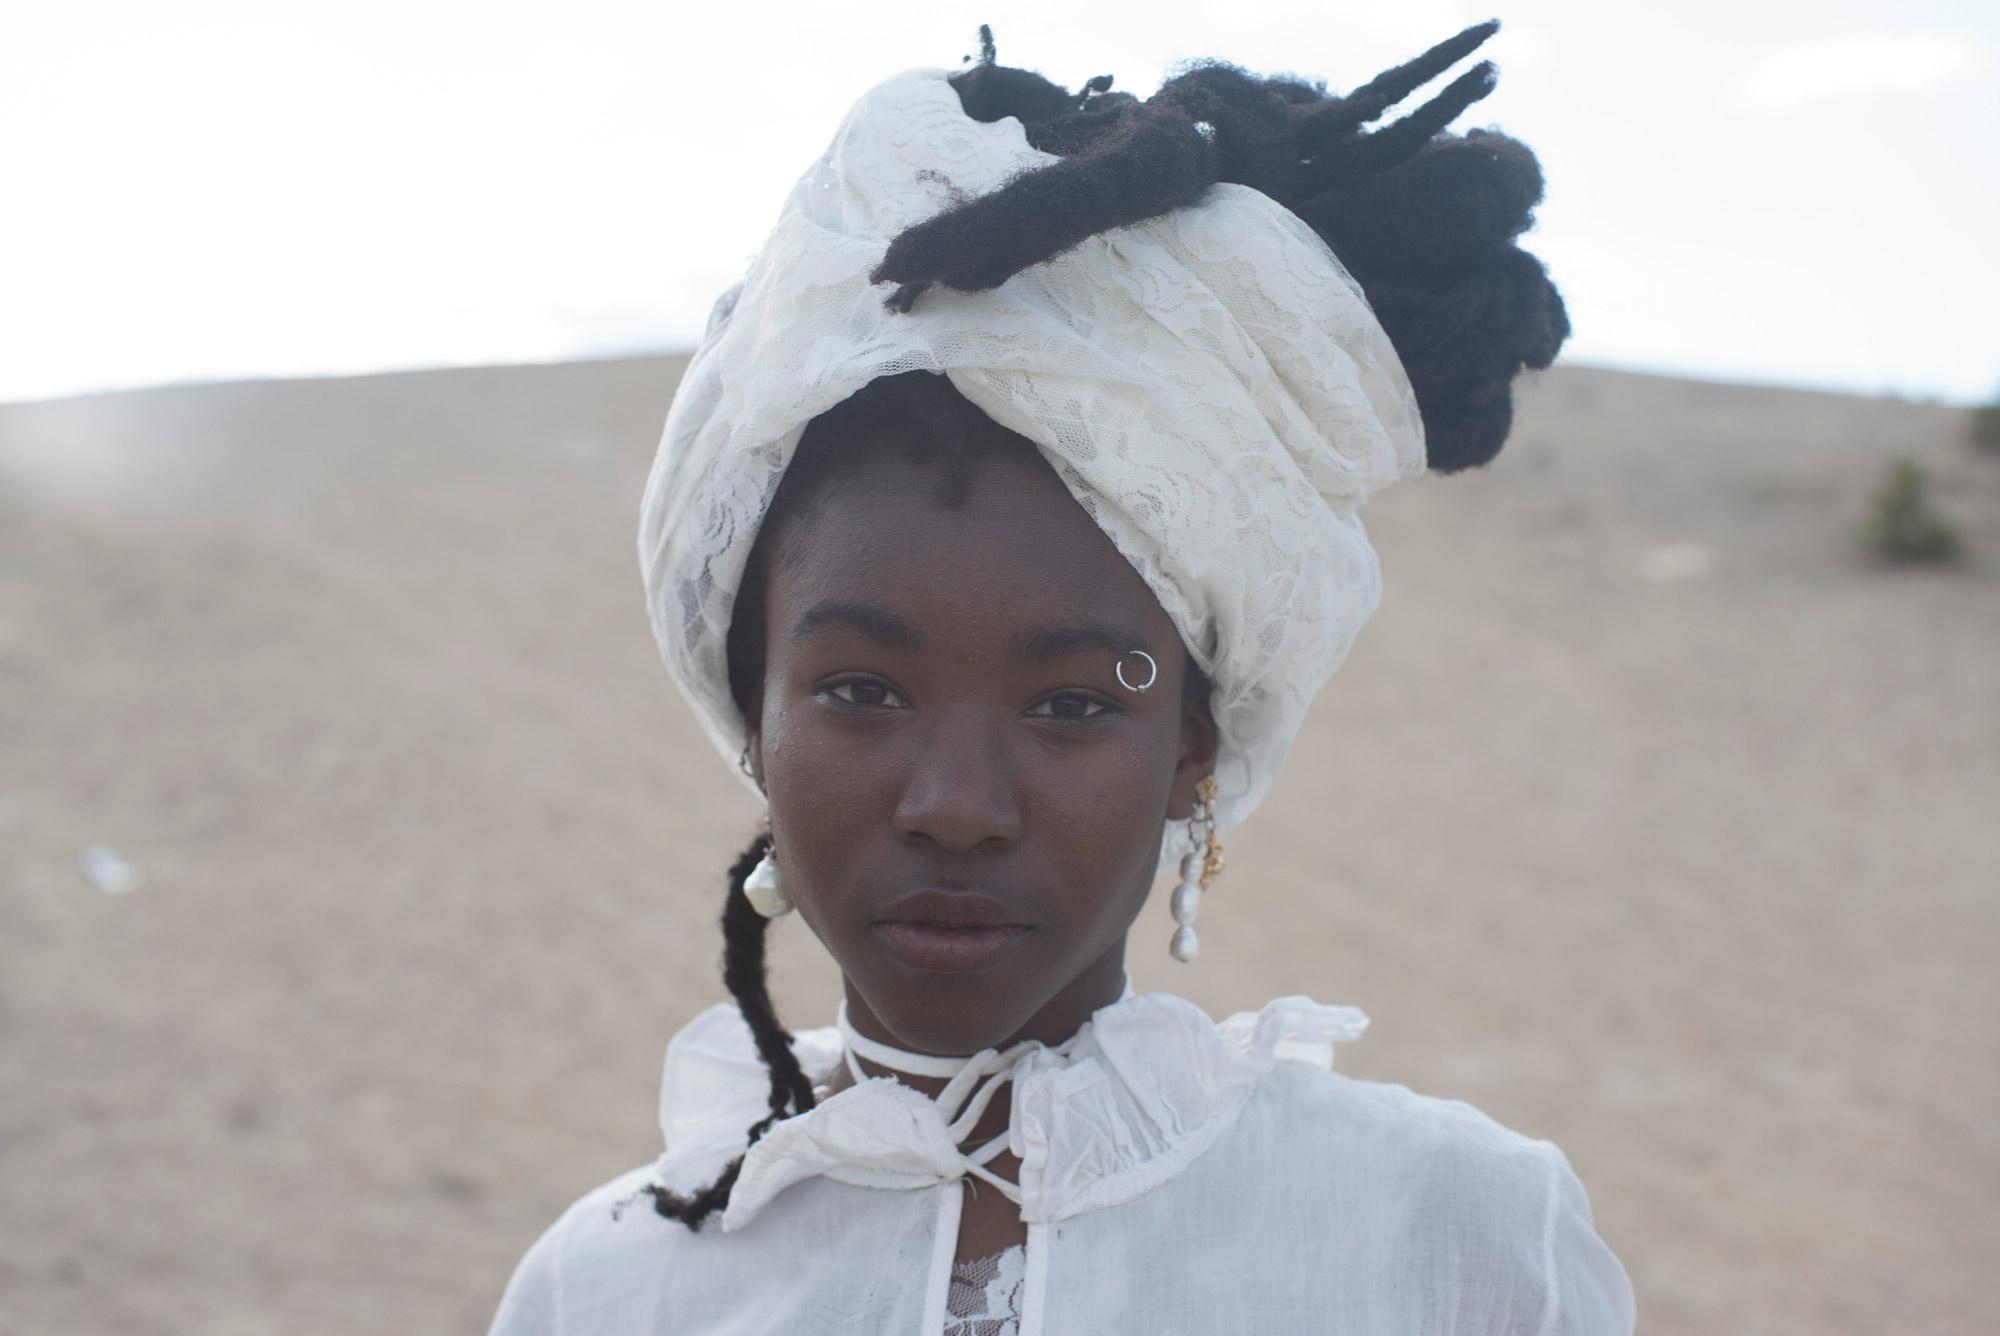 Closeup image of a model wearing a handmade dress by Windgate-Lamar Fellow Hera Ford